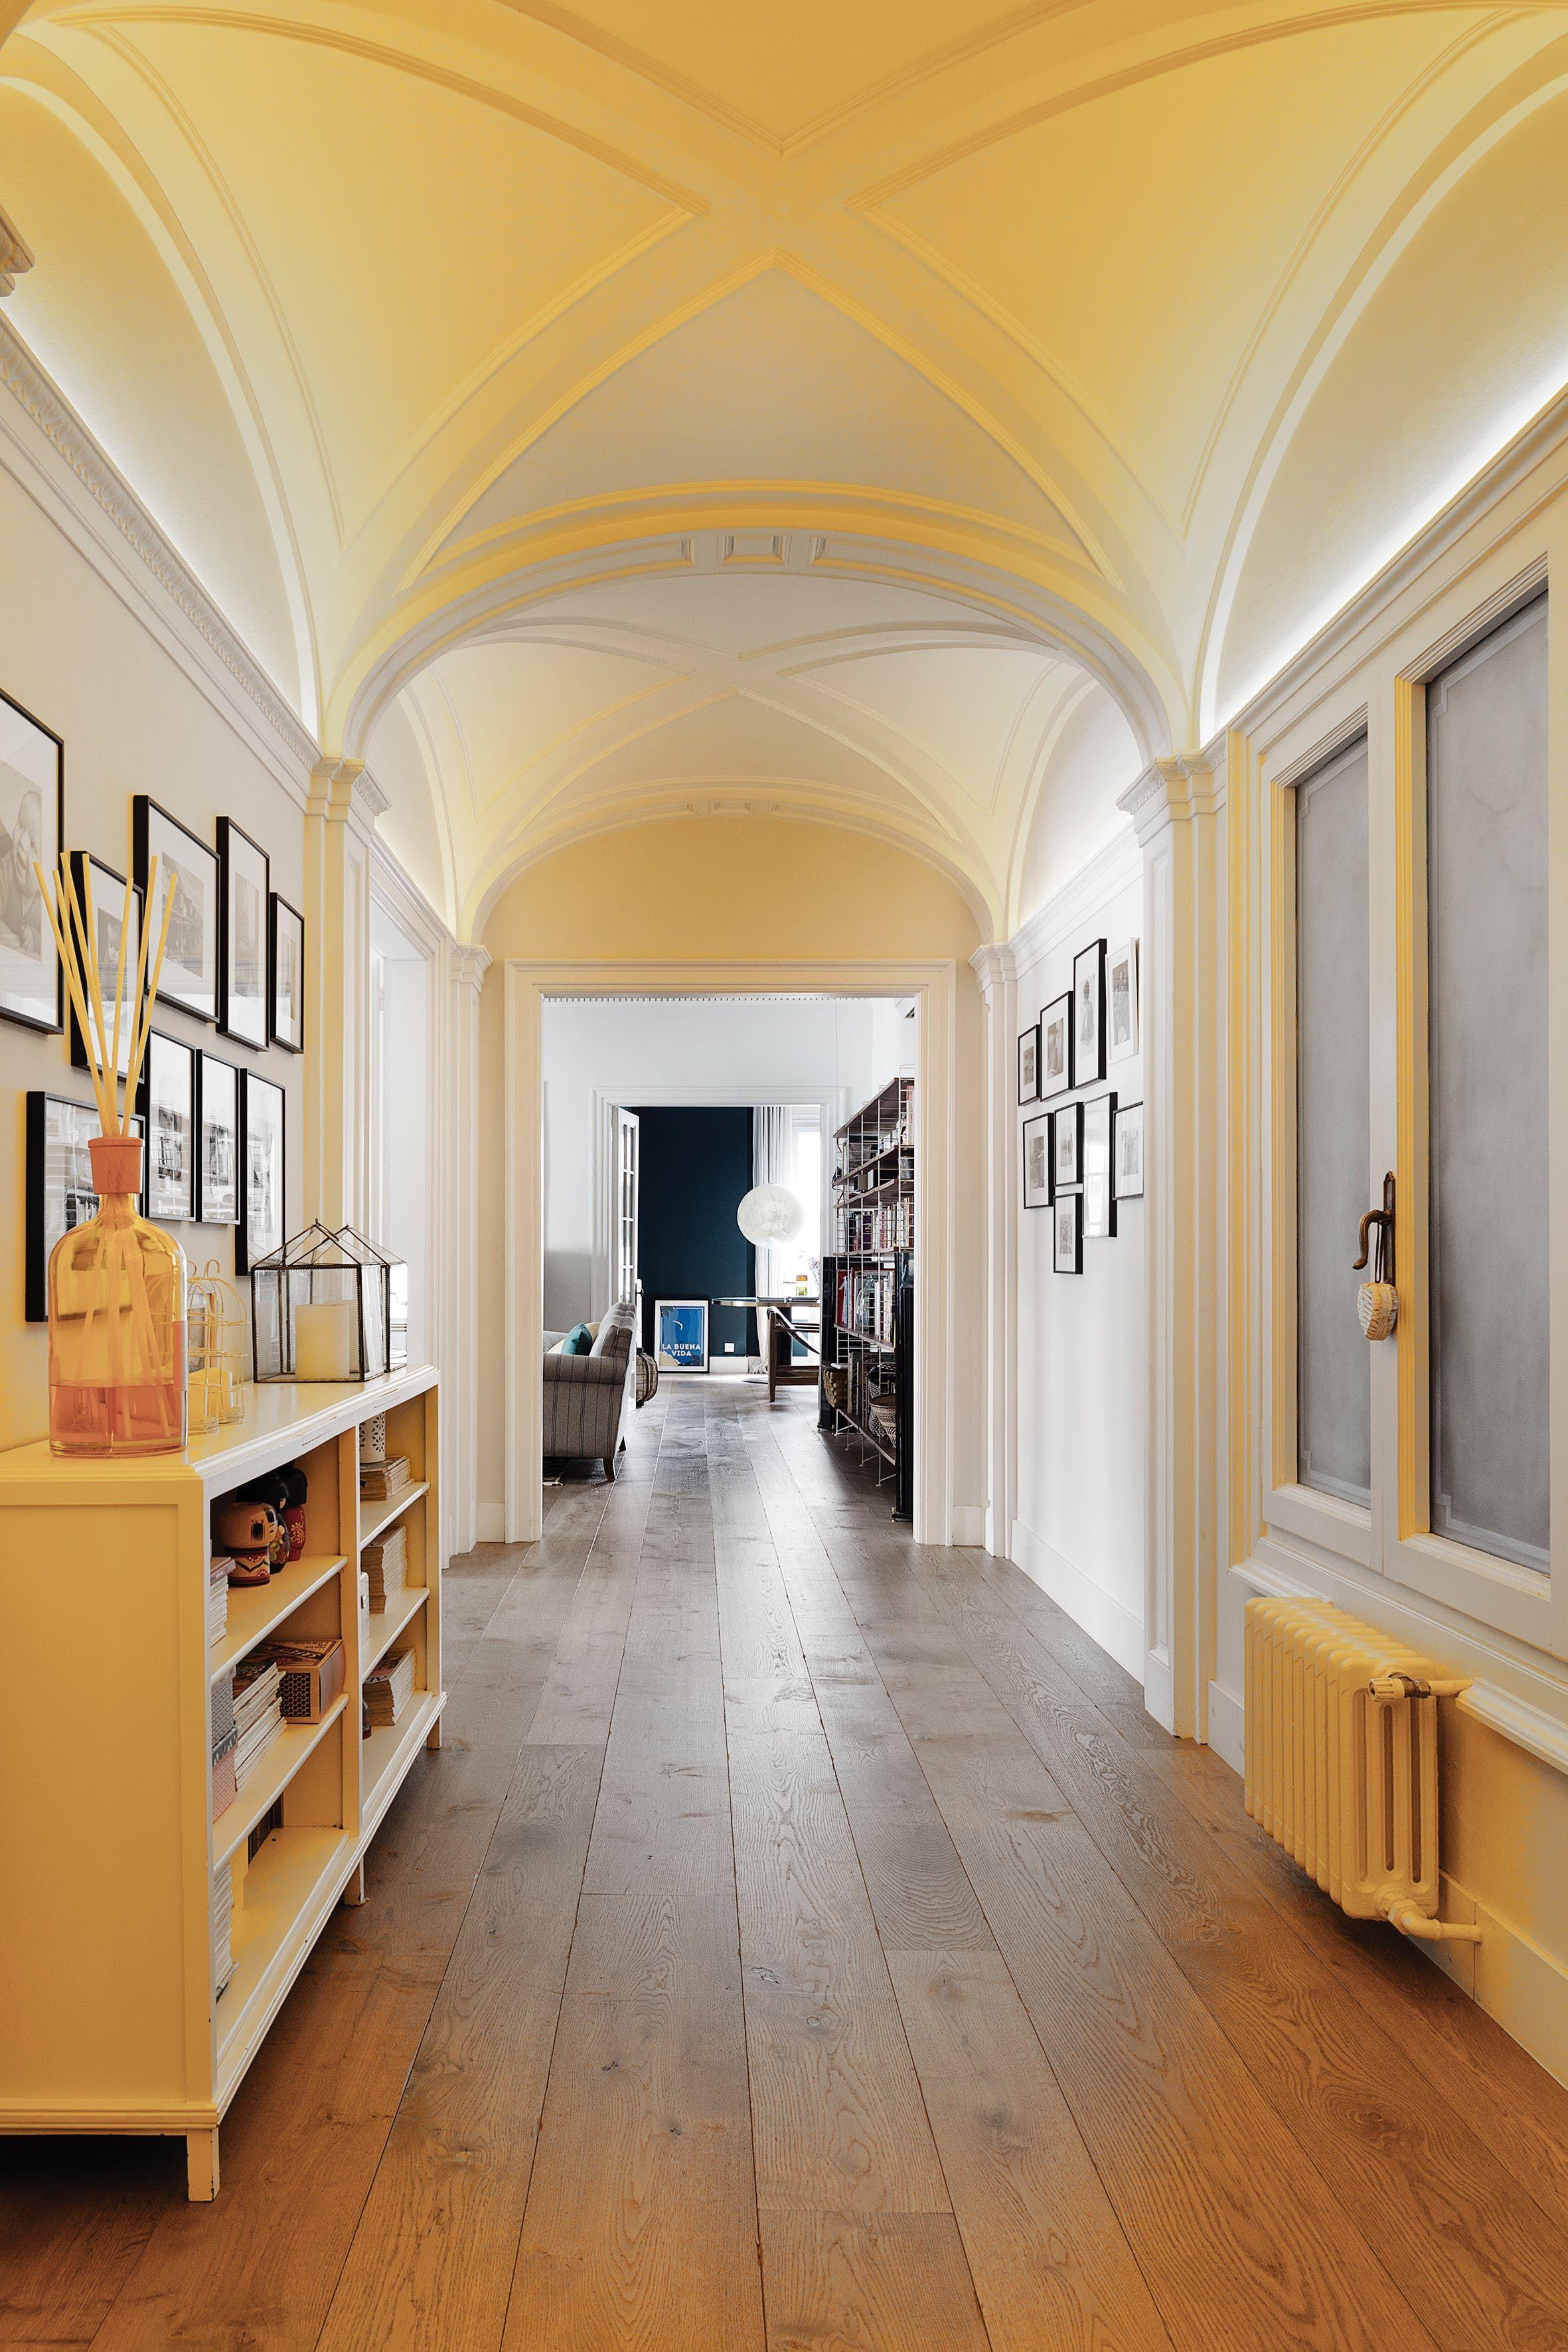 Best advice hire an interior designer